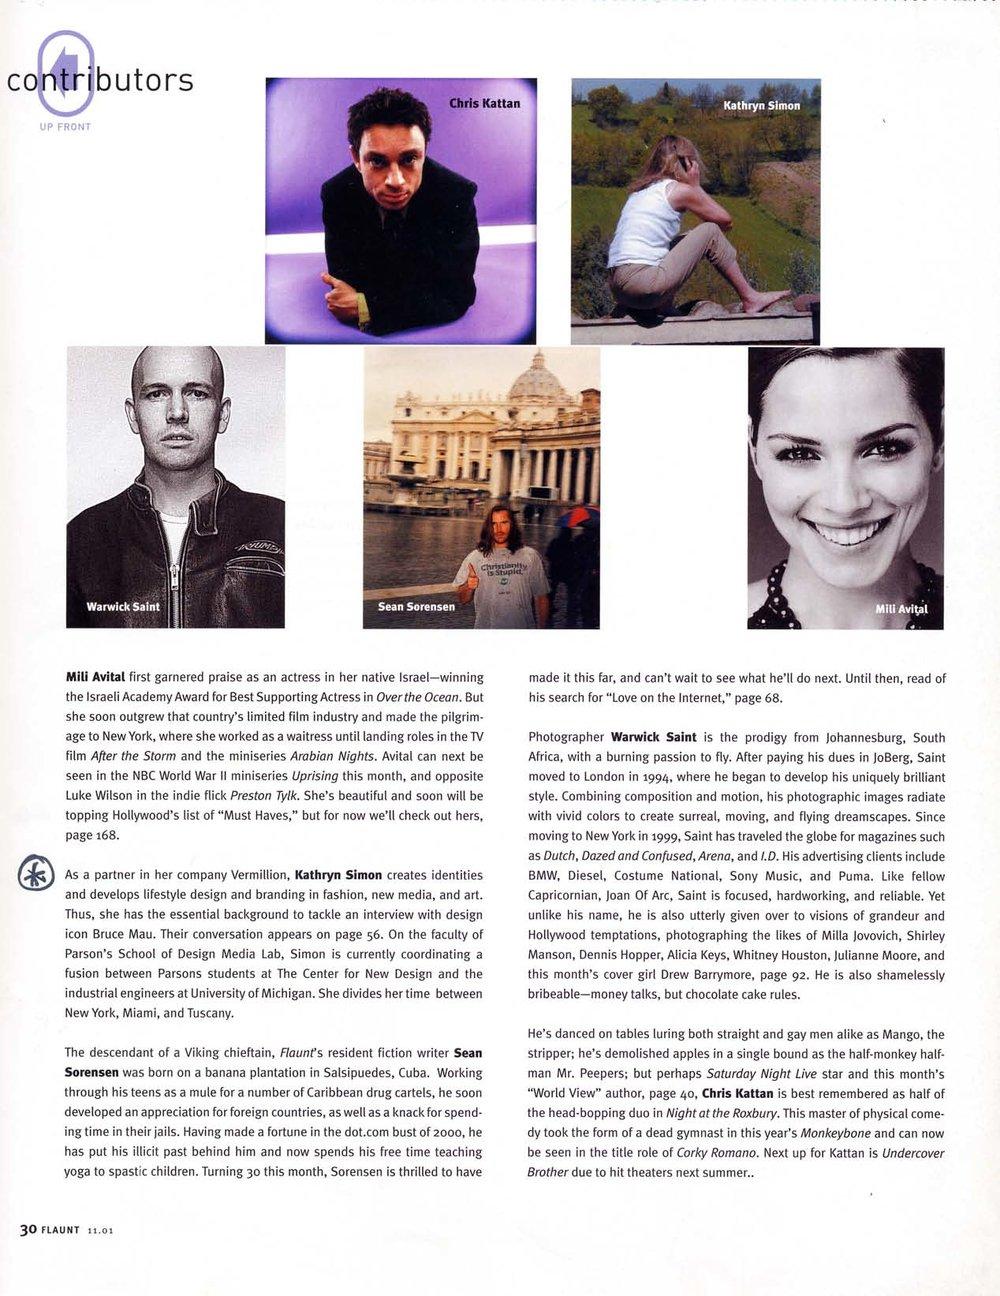 FLAUNTBruce Mau interview Kathryn Simon_Page_4.jpg